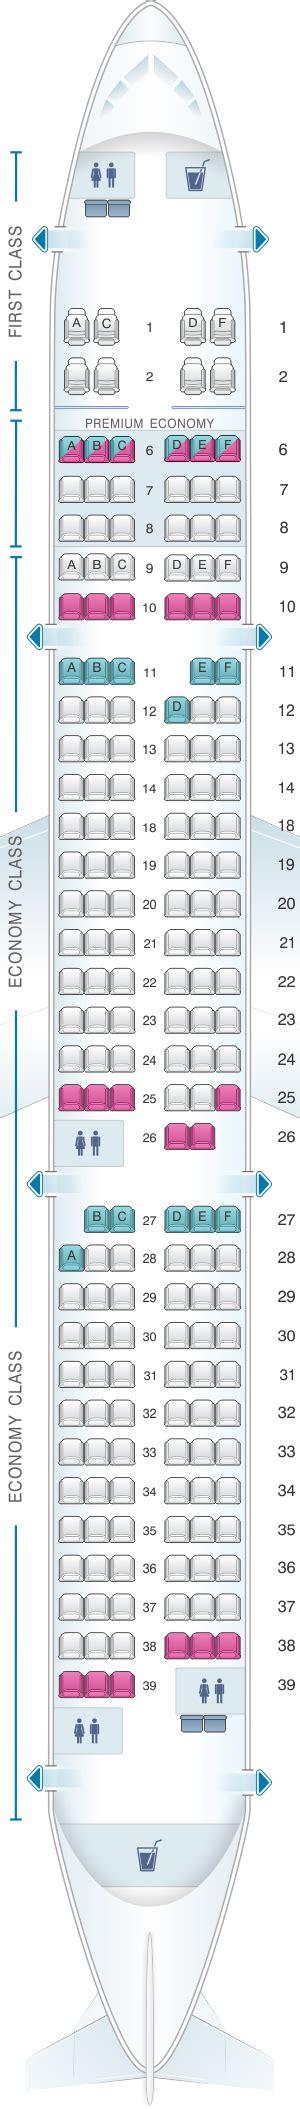 Seat Map Alaska Airlines - Horizon Air Airbus A321 NEO